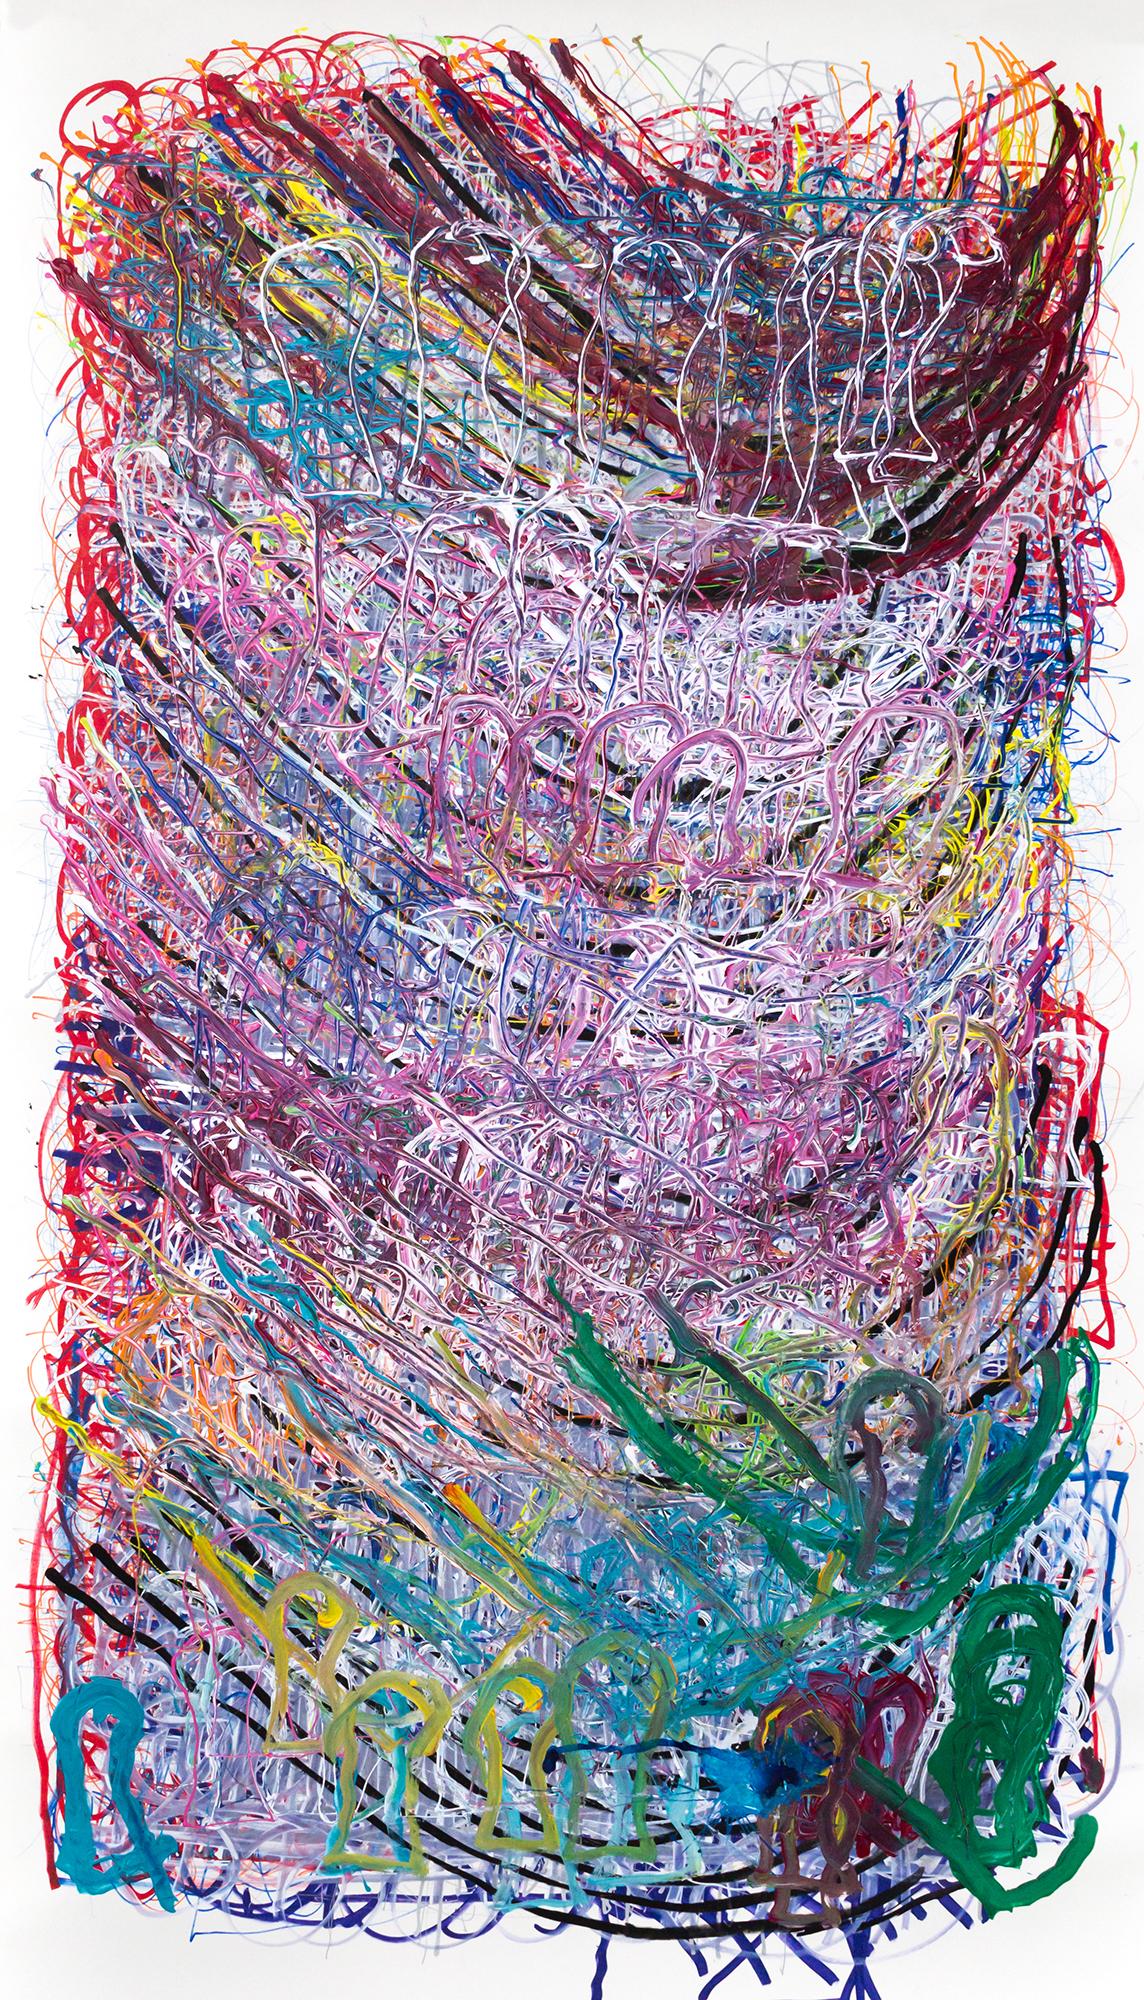 Dan Miller, Untitled (DM 1102), 2019, 55.75 x 98 inches